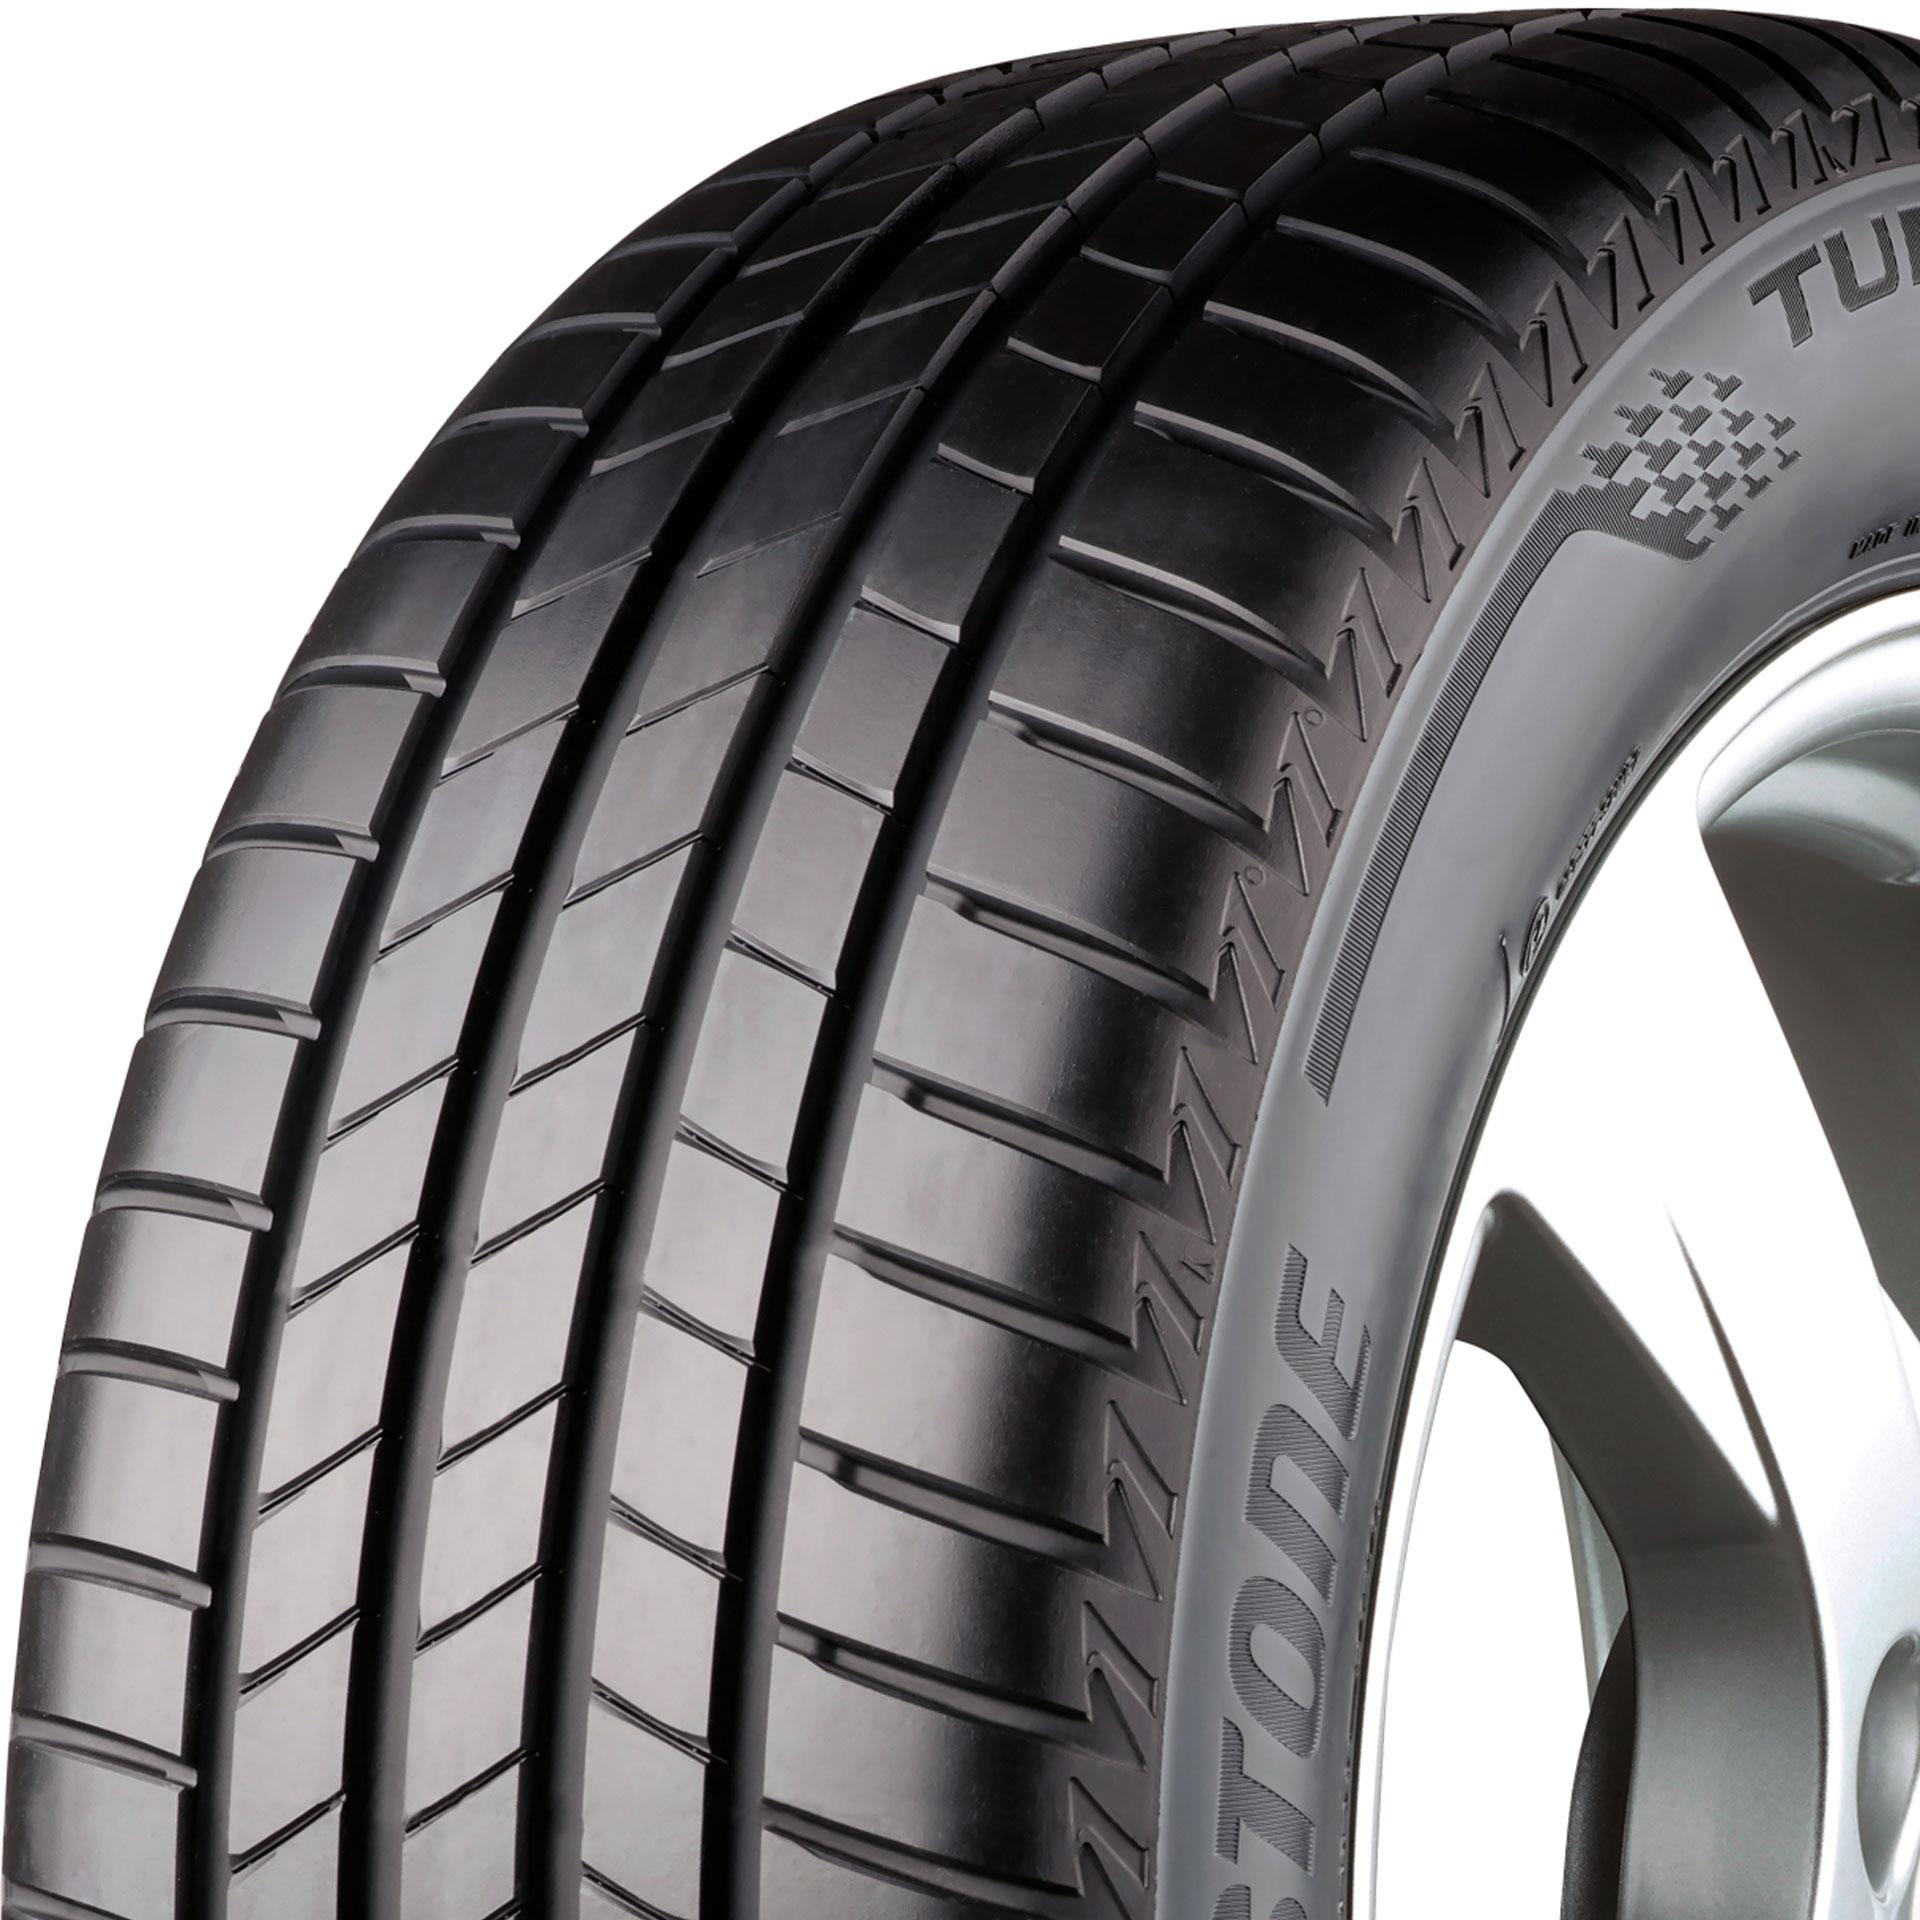 185/50 R16 81H Bridgestone Turanza T001